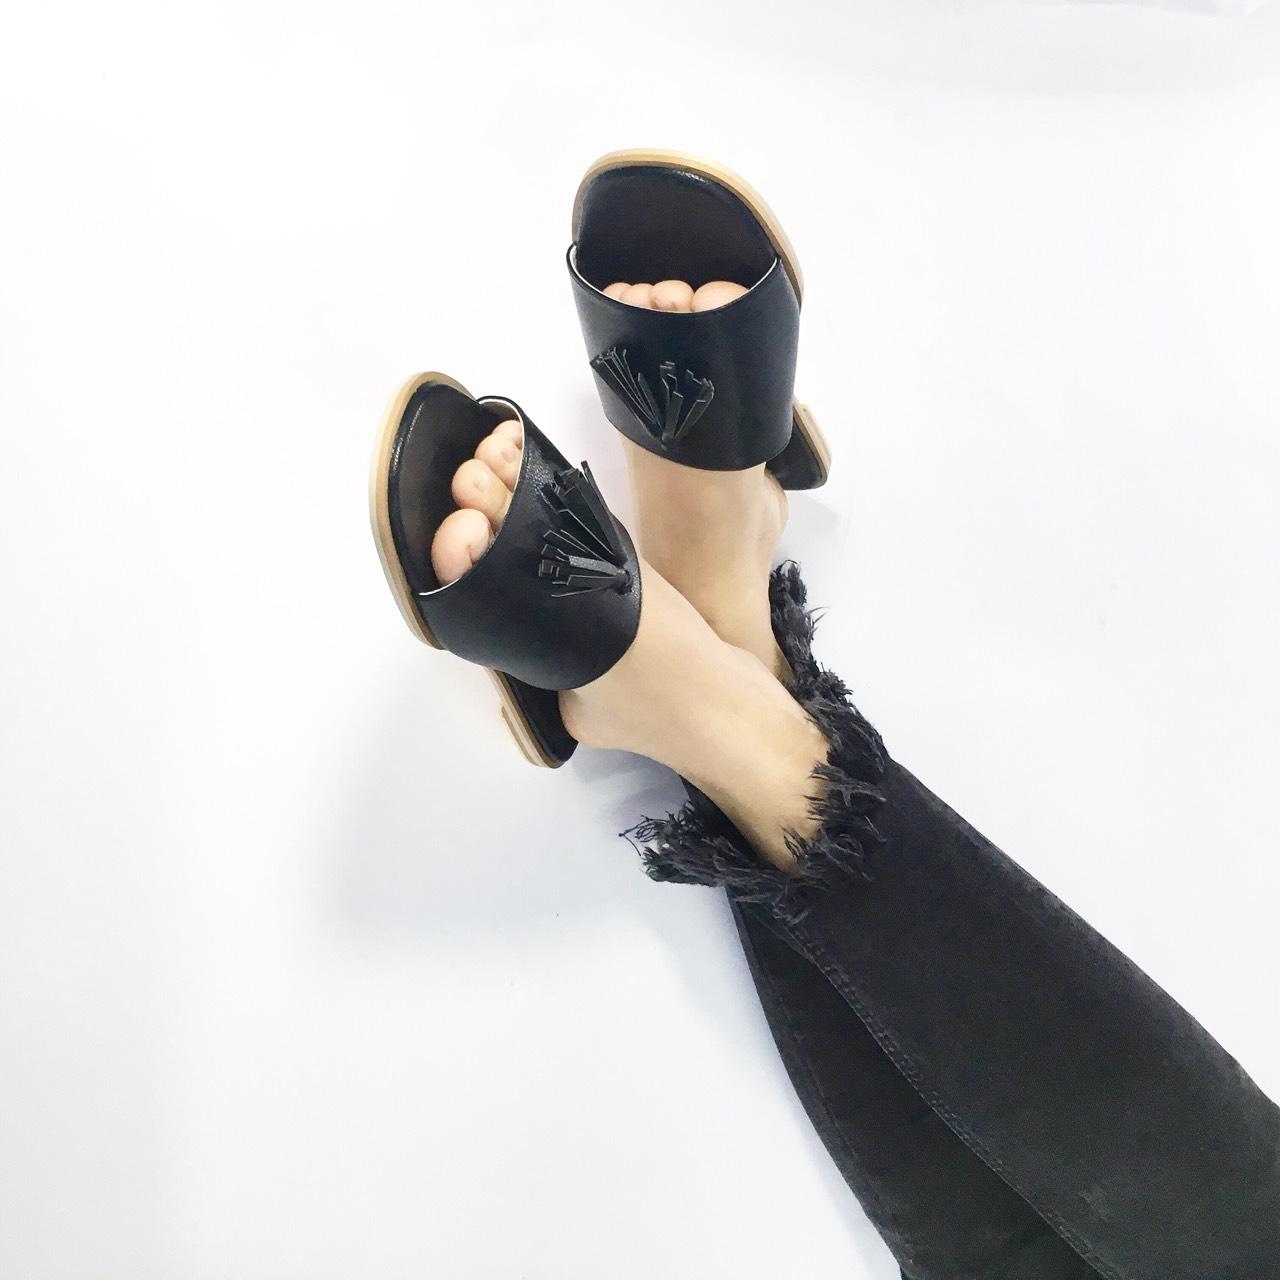 sandals,fashion,womenfashion,womenshoes,shoes,รองเท้าแตะ,รองเท้าแฟชั่น,รองเท้าแตะสวม,รองเท้าผู้หญิง,รองเท้านิ่ม,Whiteoakshoes